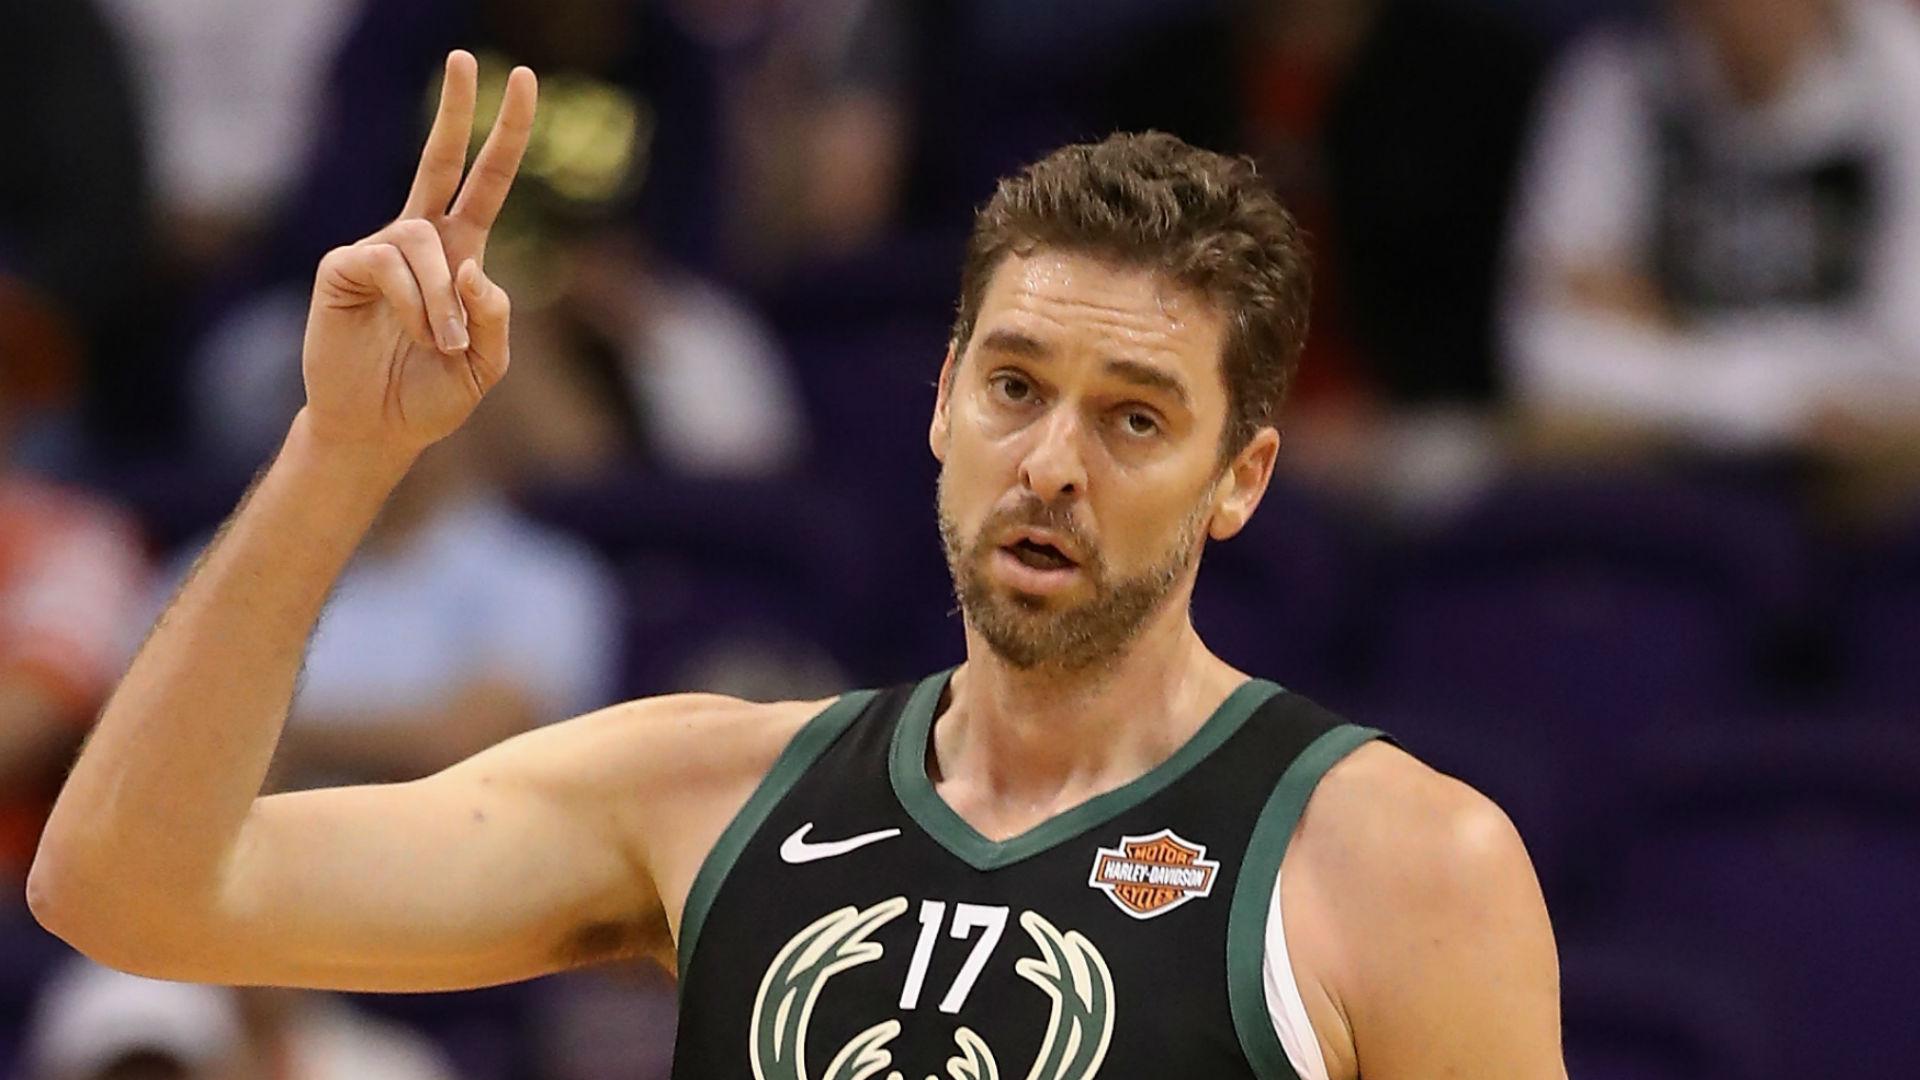 NBA playoffs 2019: Bucks' Pau Gasol to miss rest of postseason after foot surgery